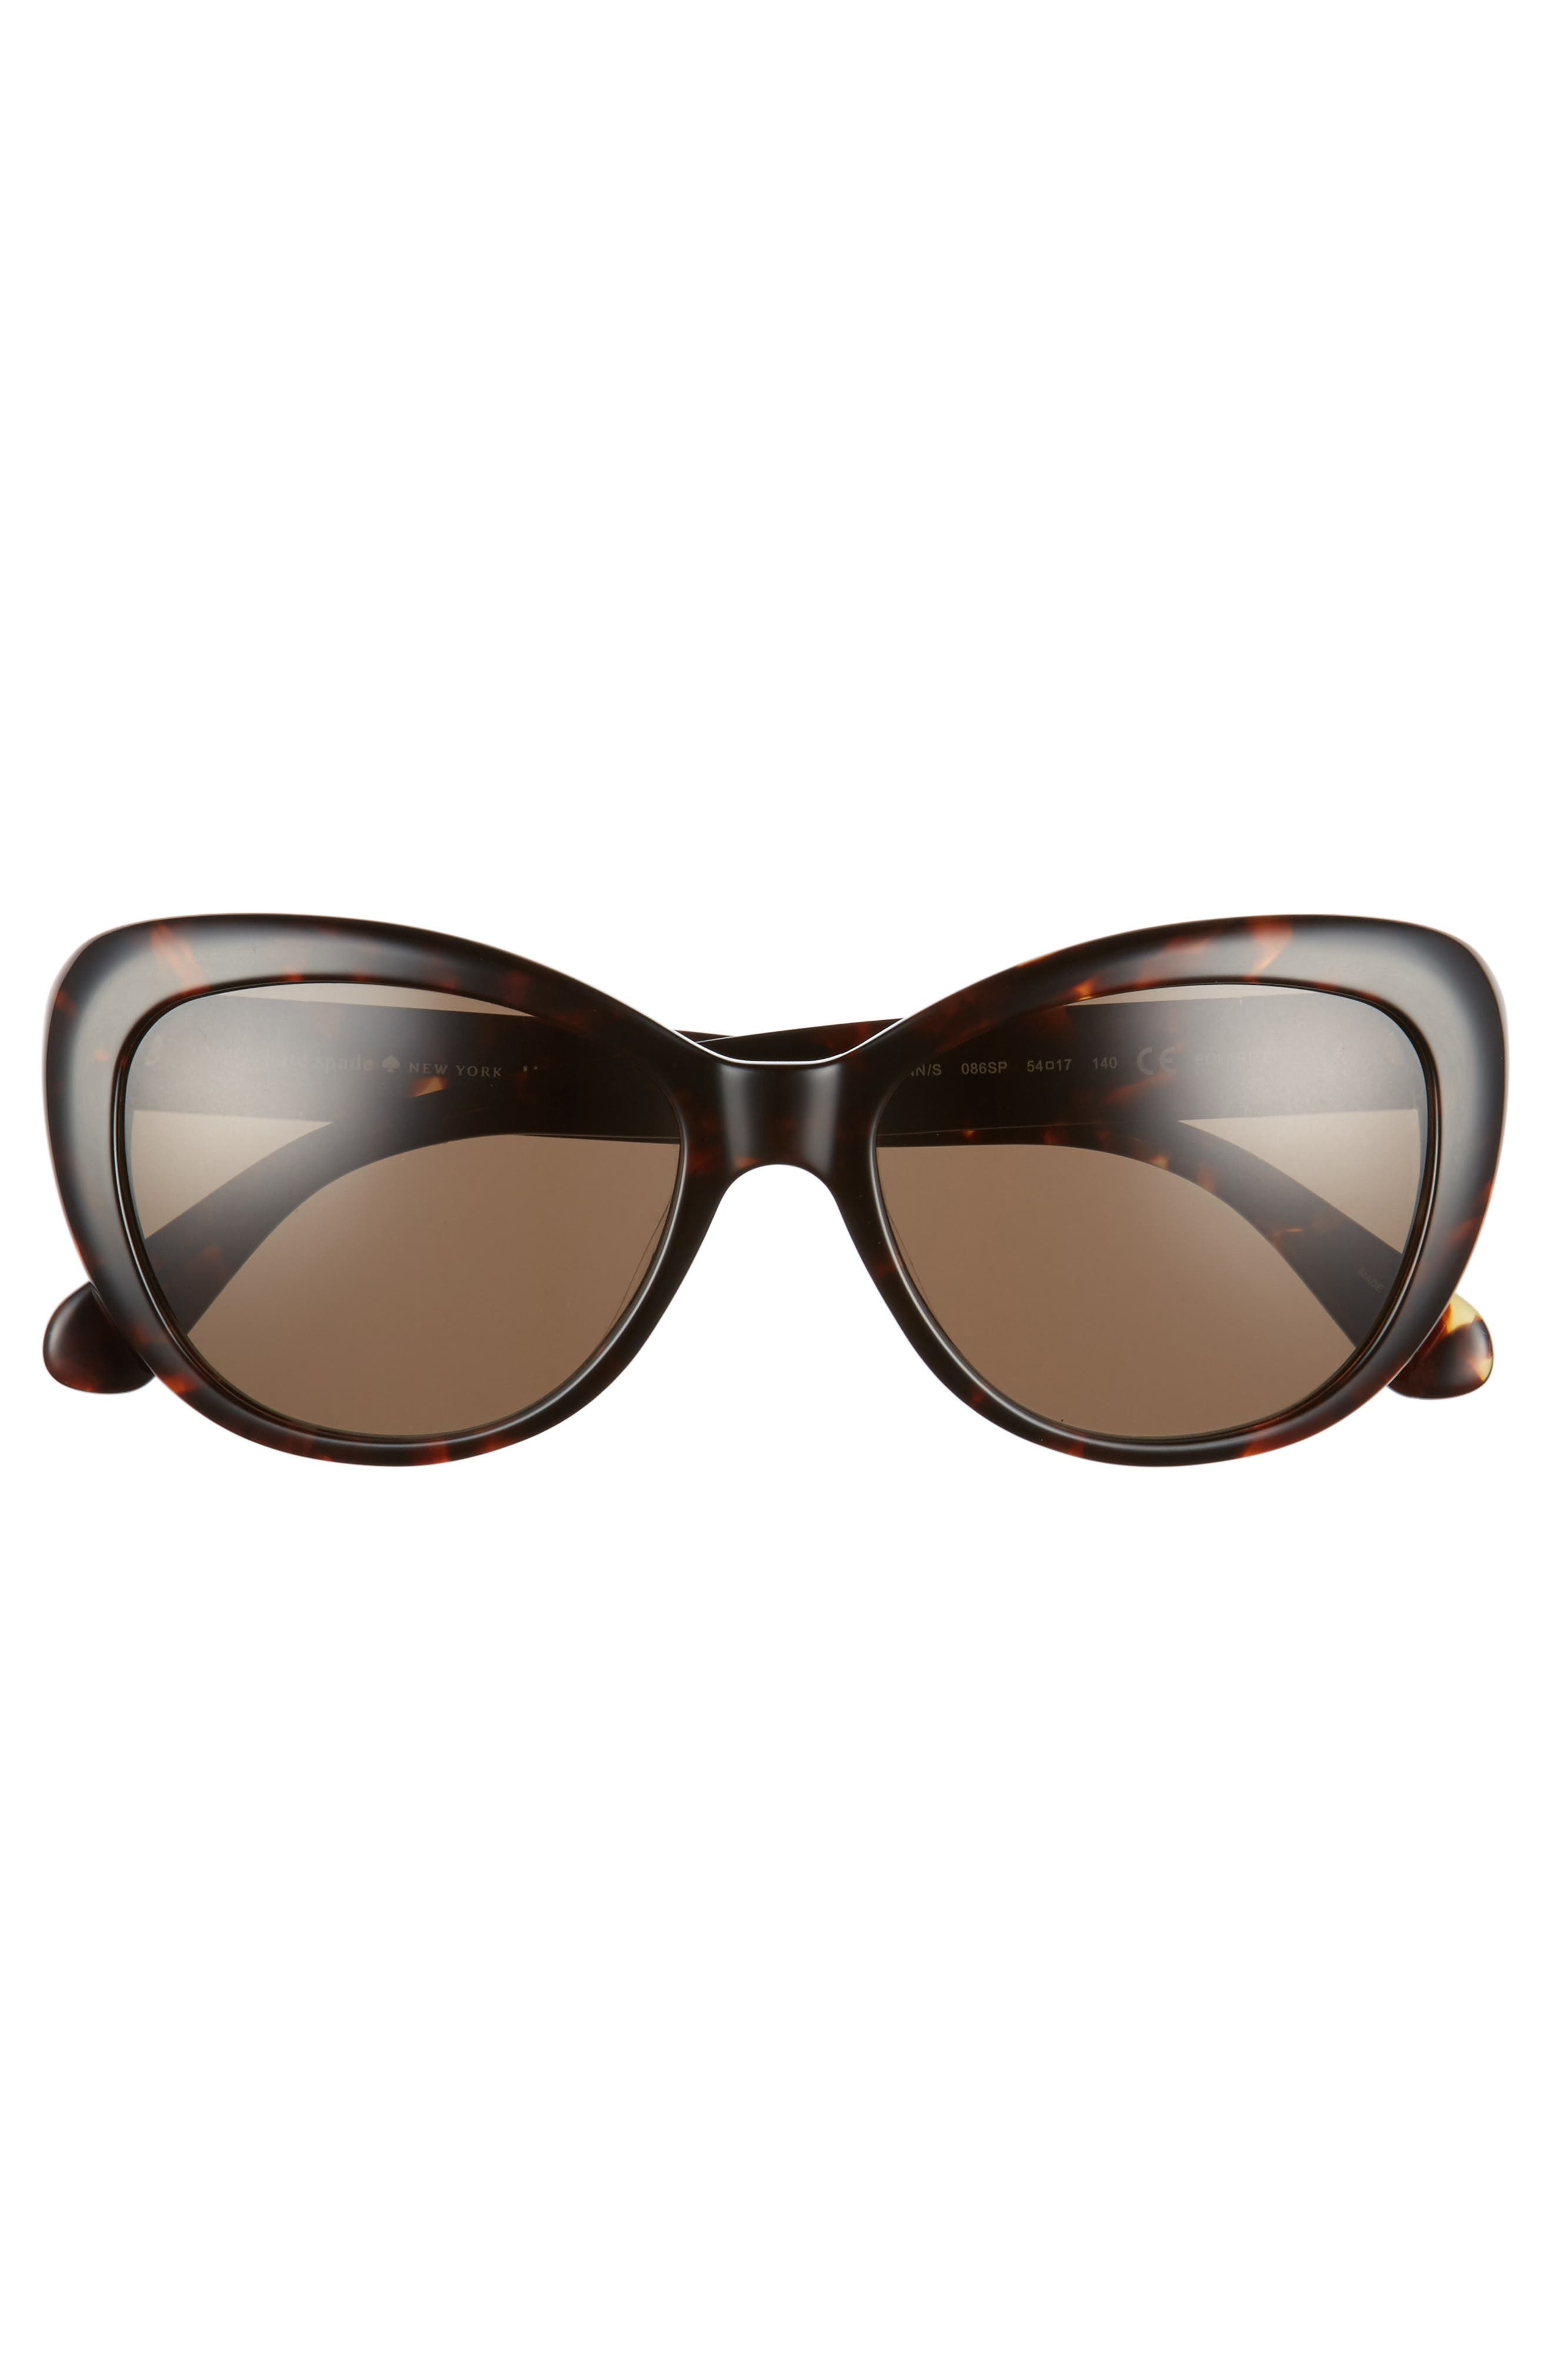 emmalynn 54mm polarized cat eye sunglasses,                             Alternate thumbnail 3, color,                             Dark Havana